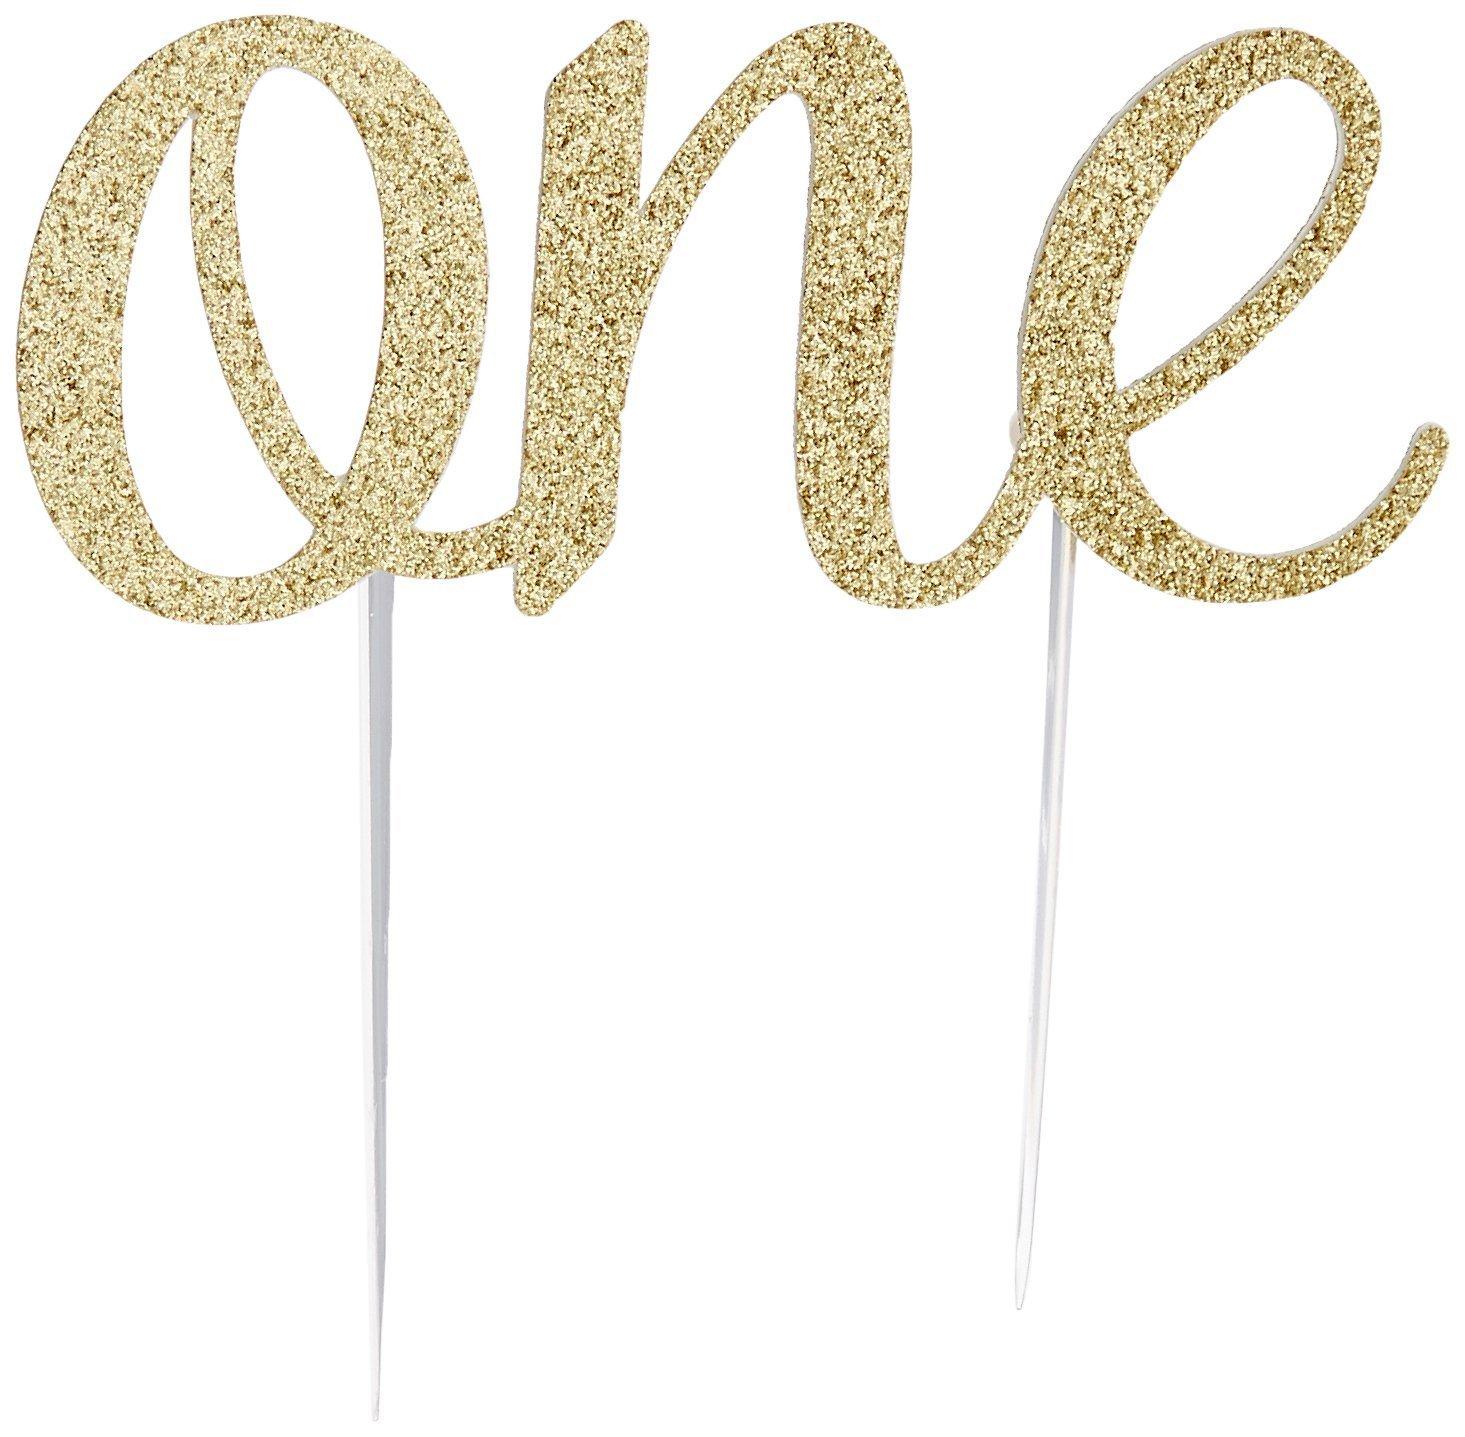 B01EQN7SX8 Handmade 1st Birthday Cake Topper Decoration - One - Double Sided Glitter Stock (Gold) 71hDjFjtiaL